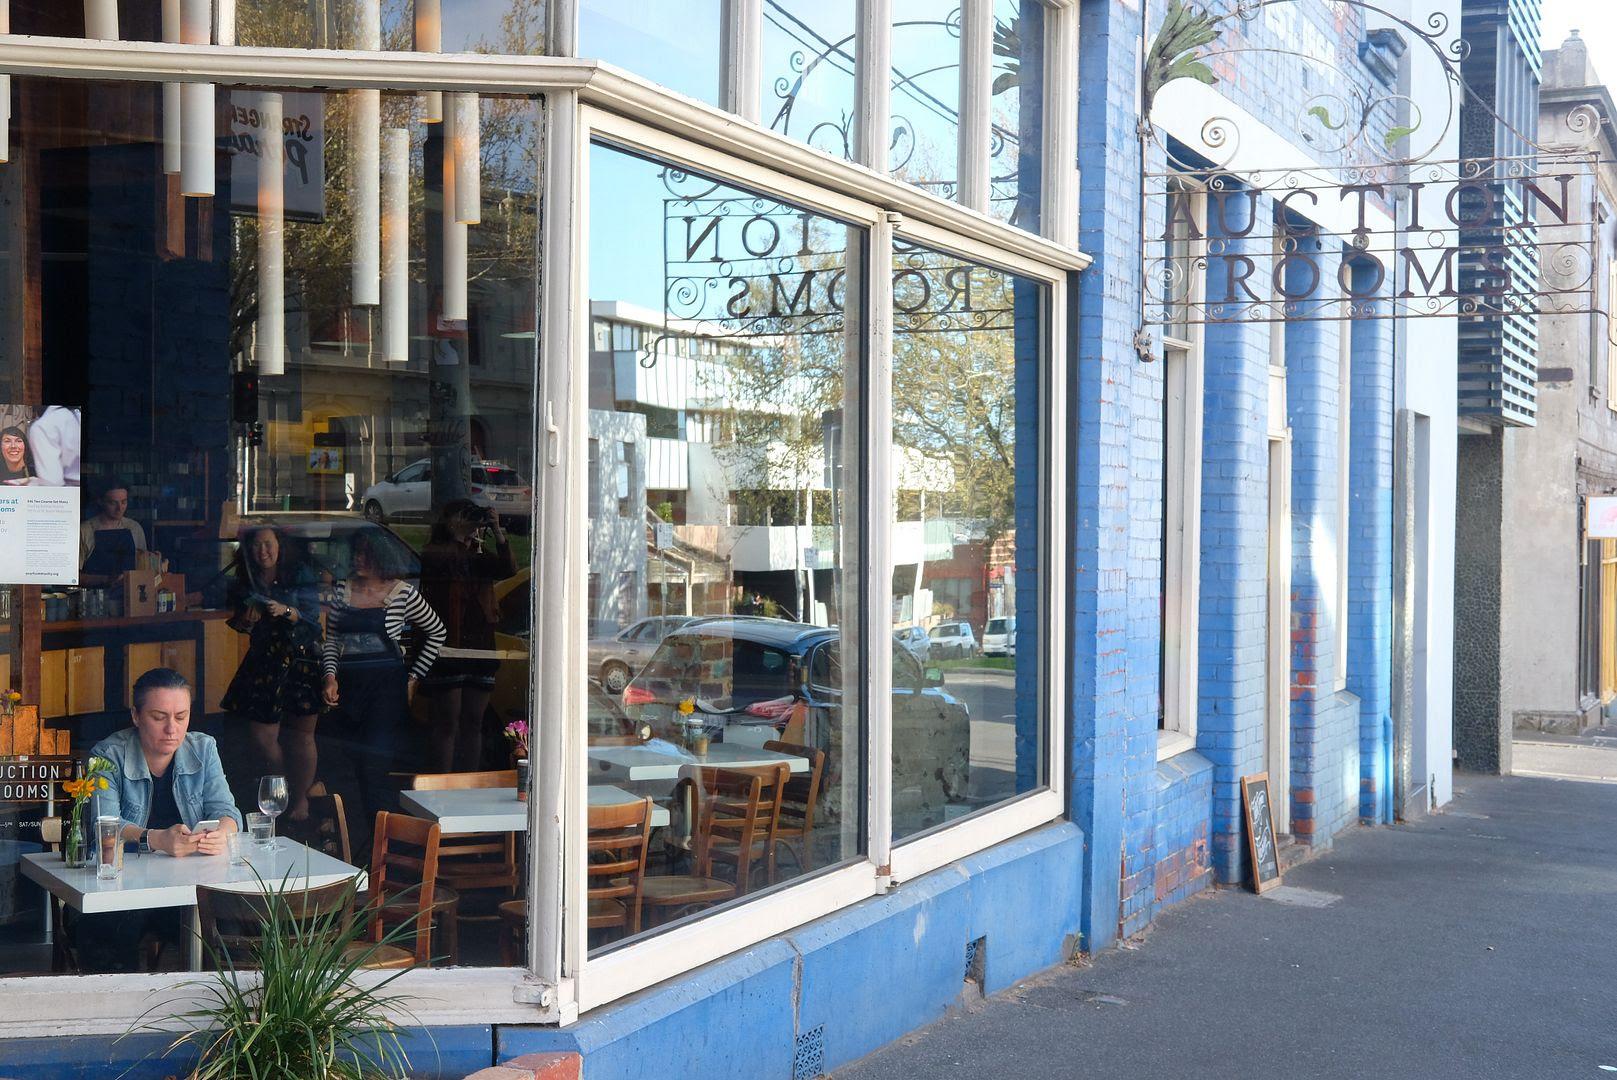 photo Auction Rooms Melbourne.jpg